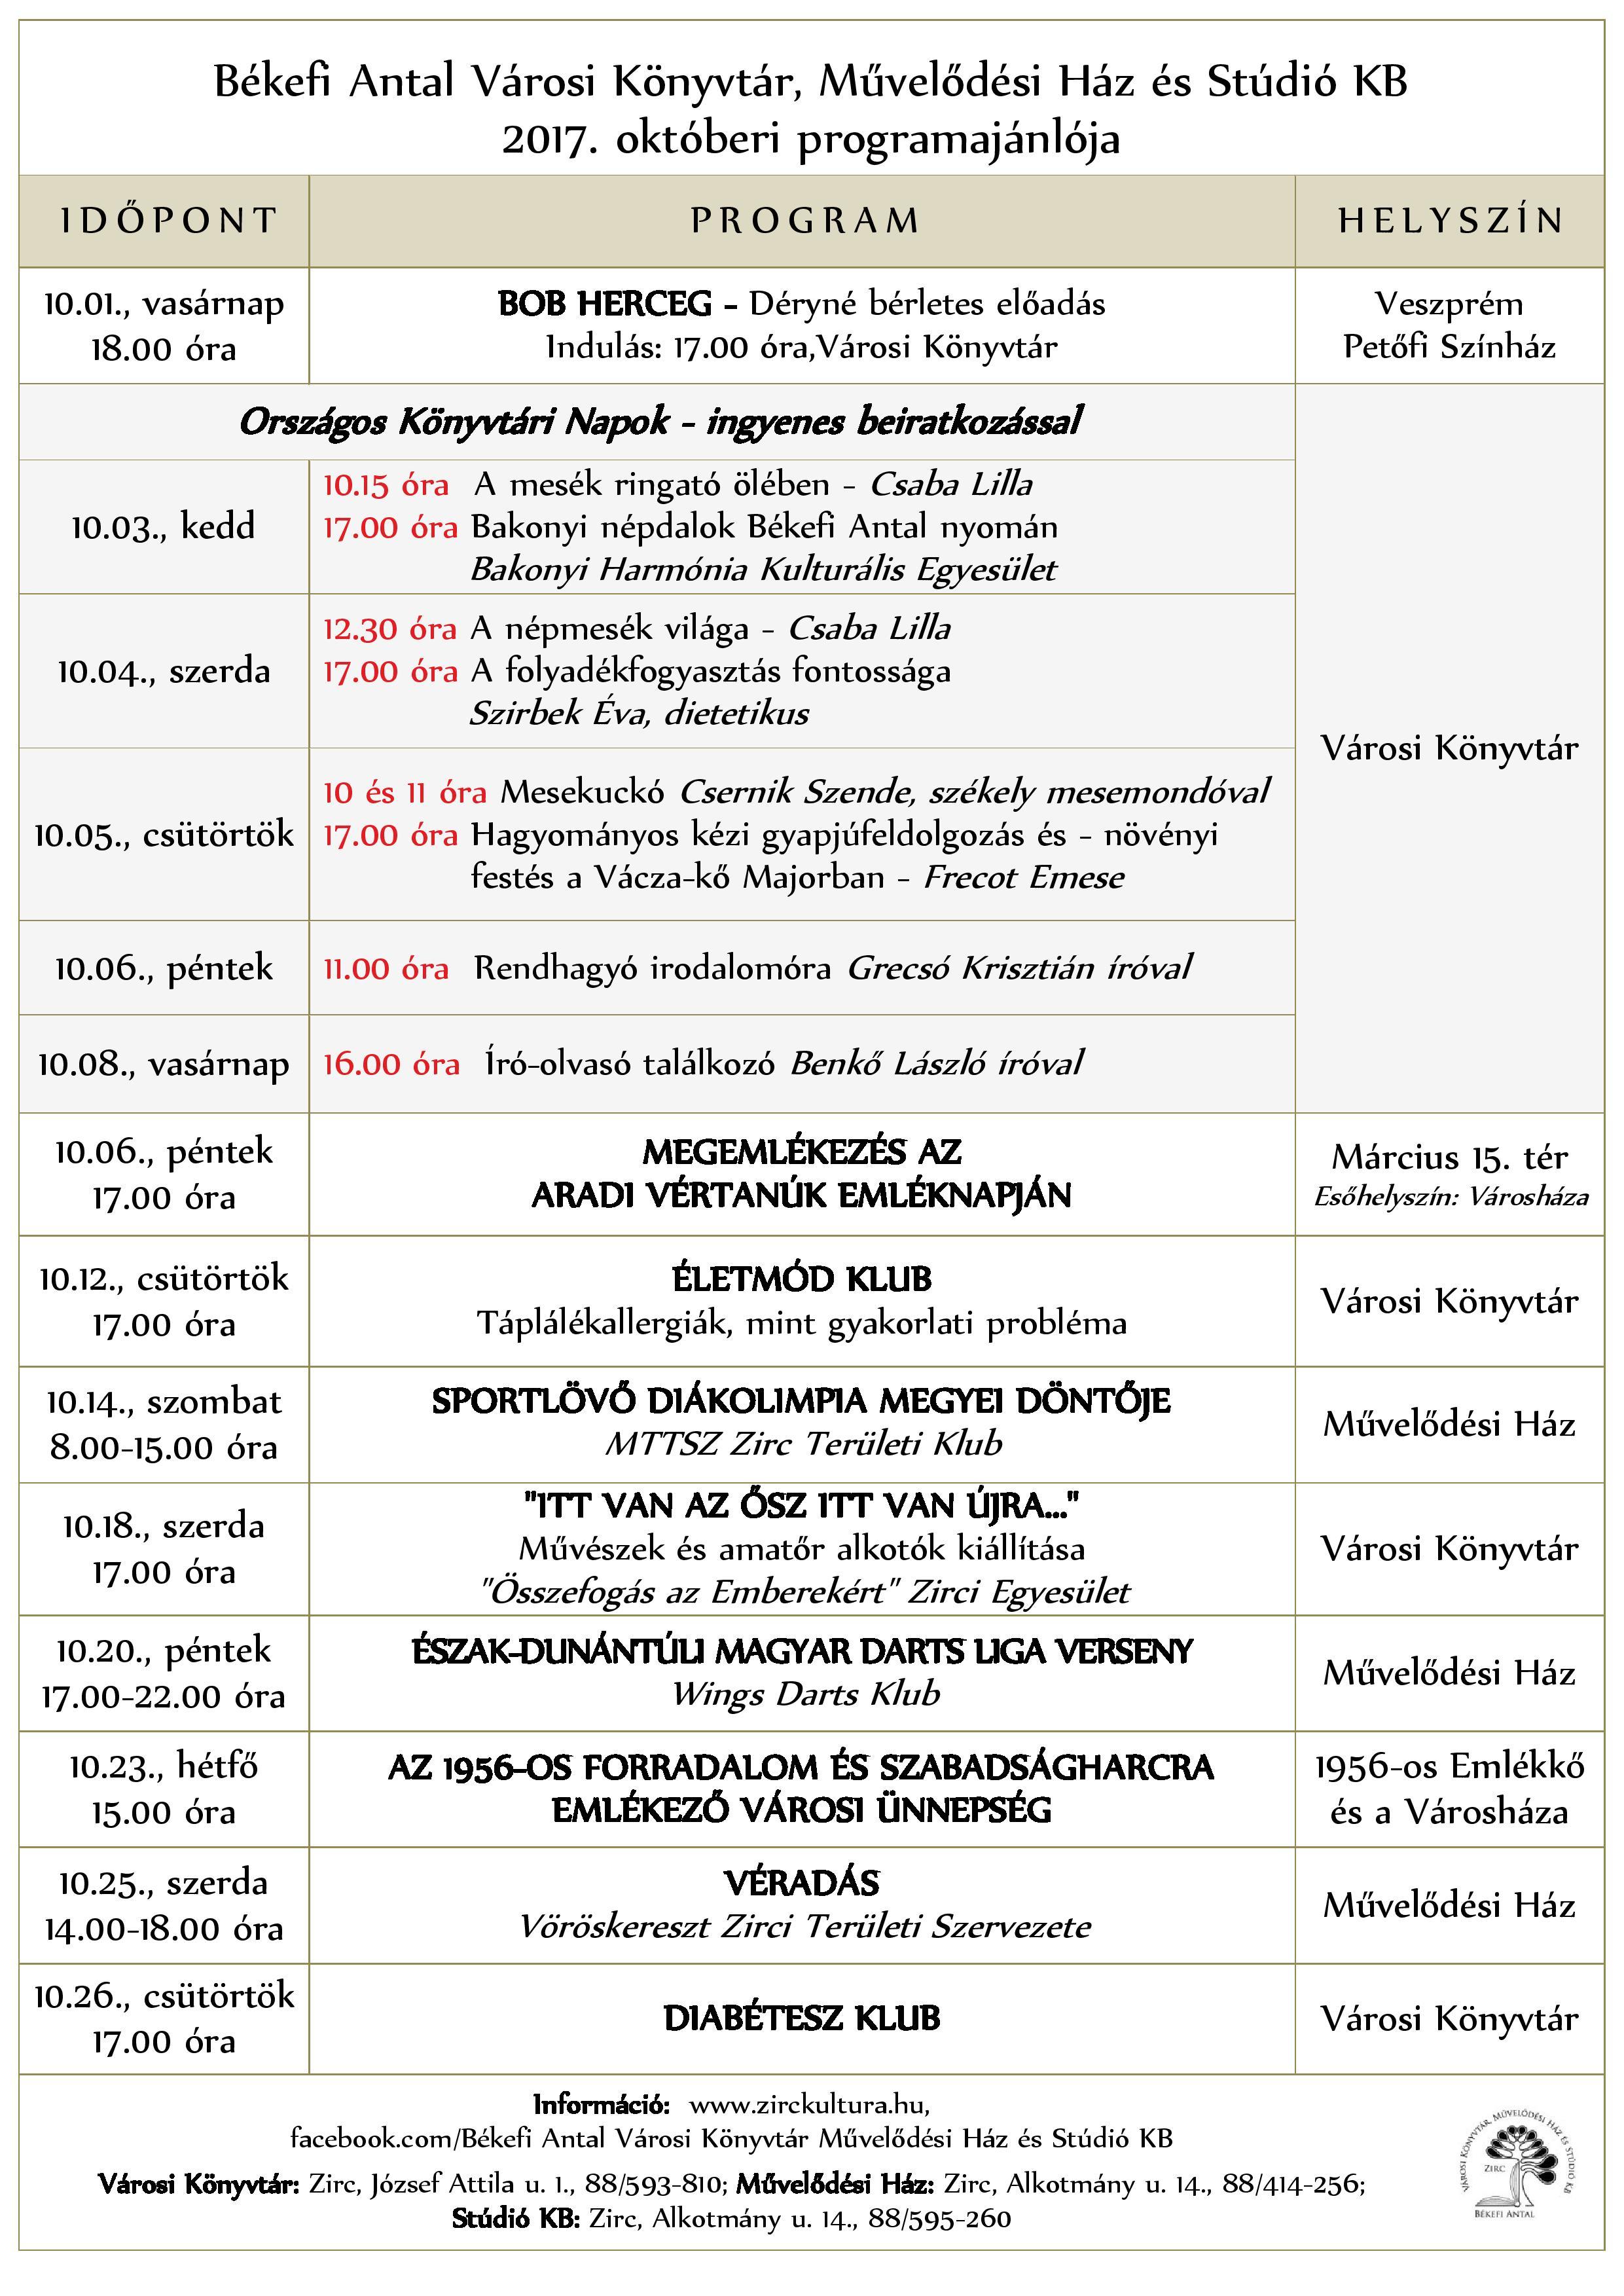 bavkmhskb_2017_10_programajanlo-page-001.jpg